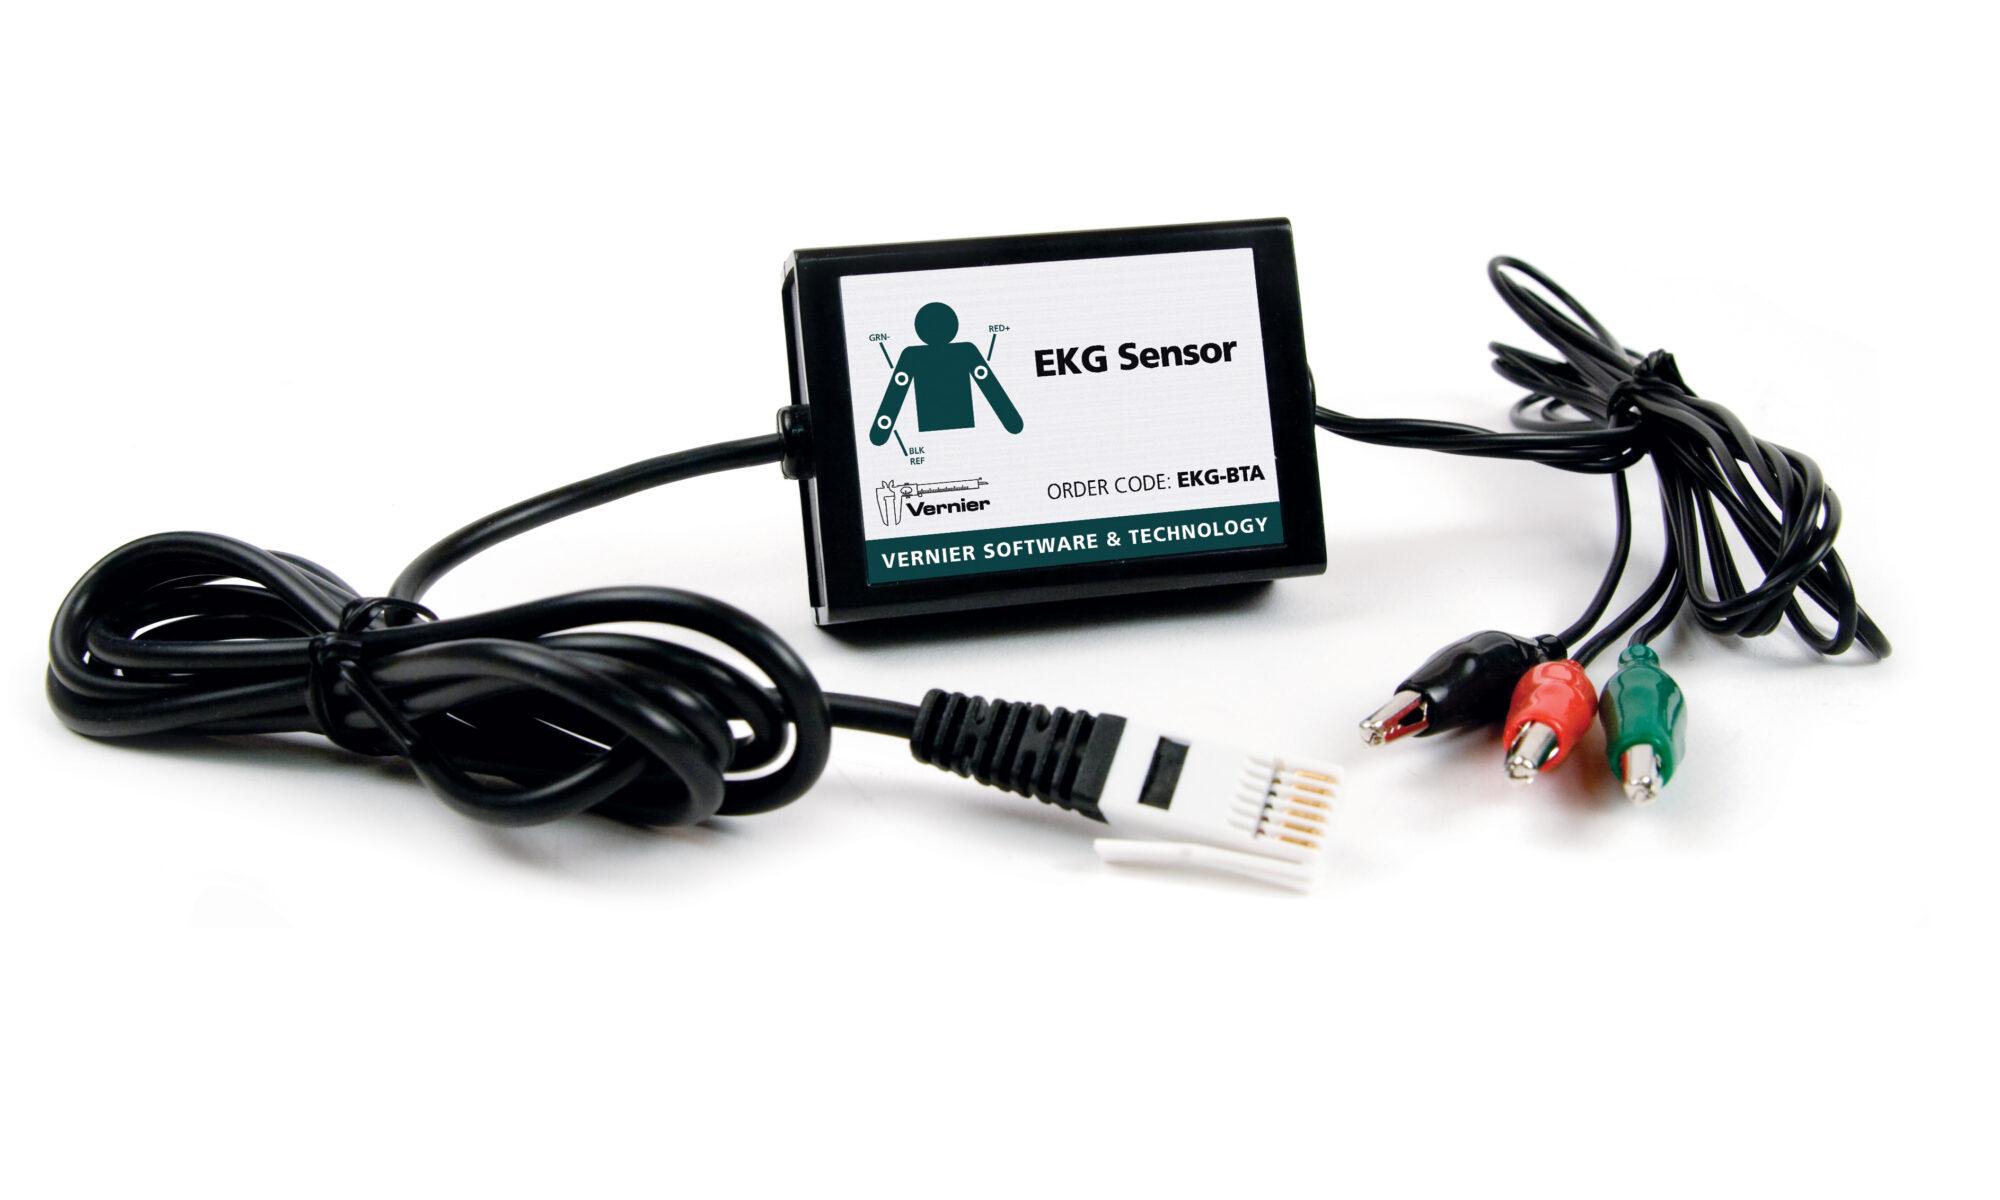 EKG Sensor product image